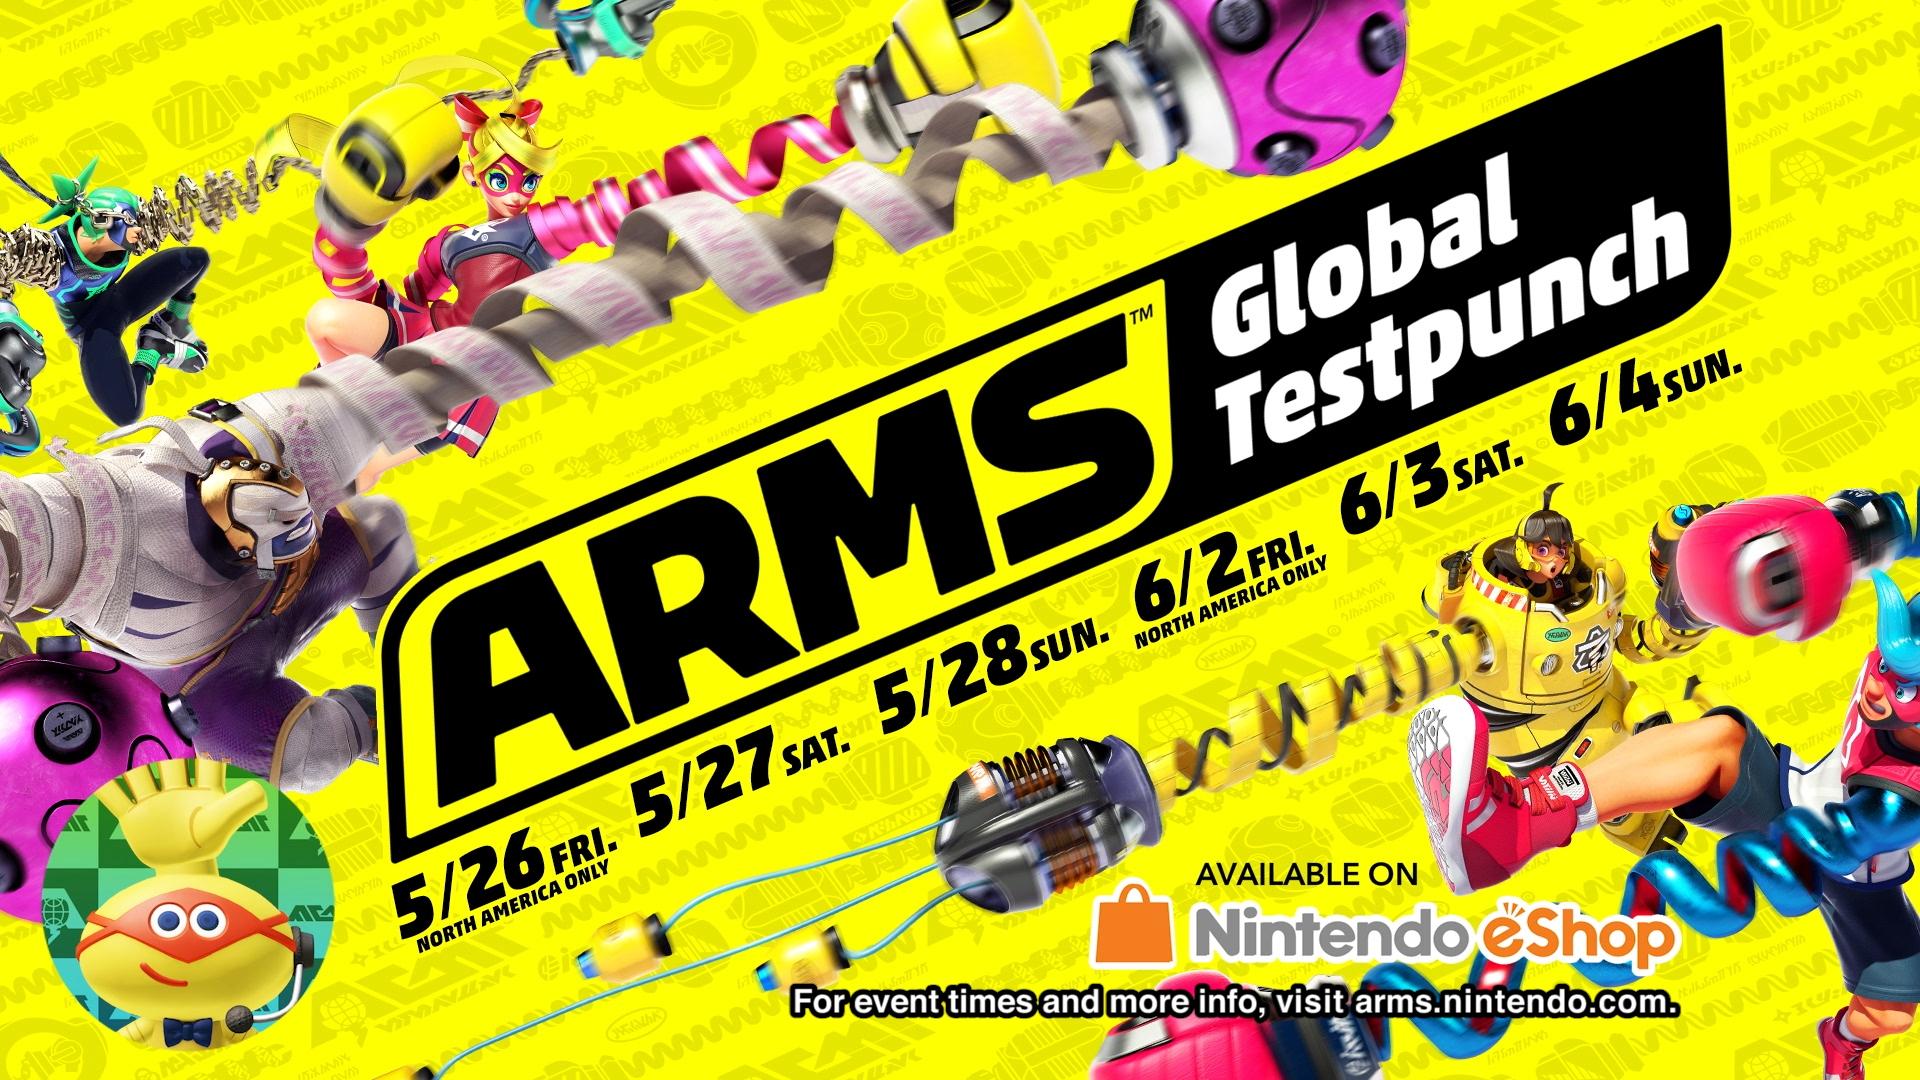 Arms na nás chystá demo Global Testpunch 144306